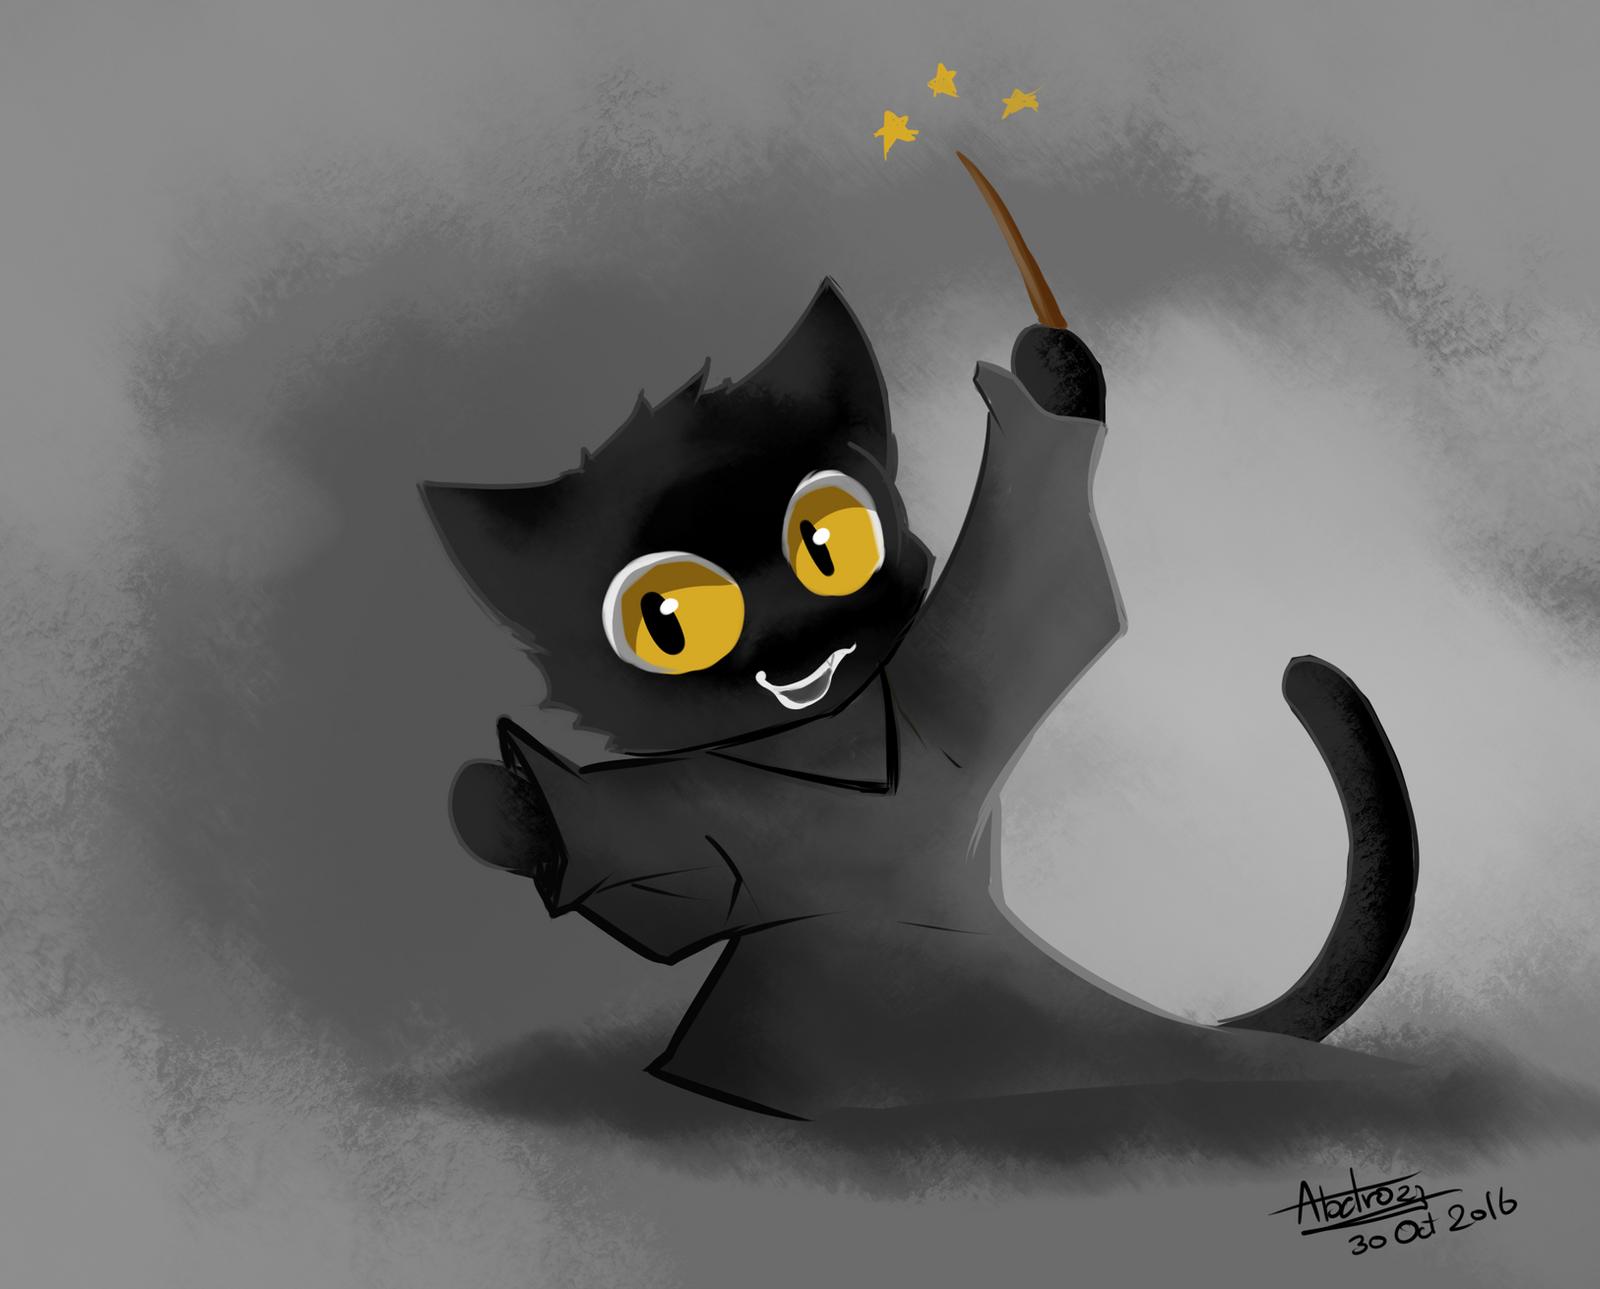 fanart google doodle halloween black cat by abatrozz on deviantart